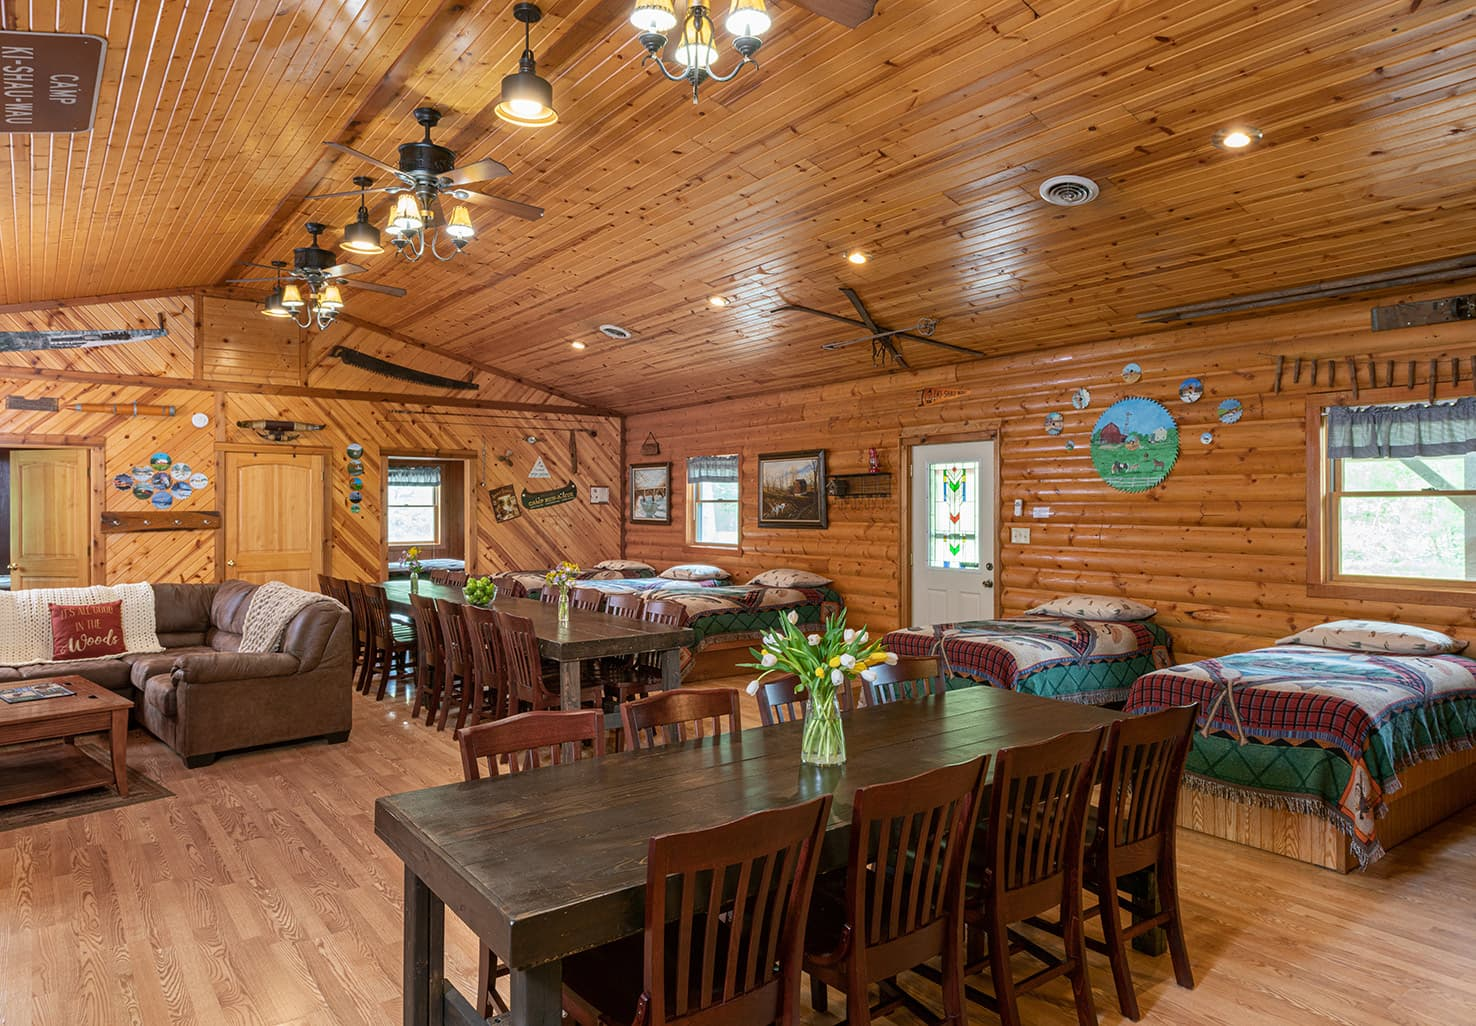 Grandma's Cabin, perfect for Illinois family reunions